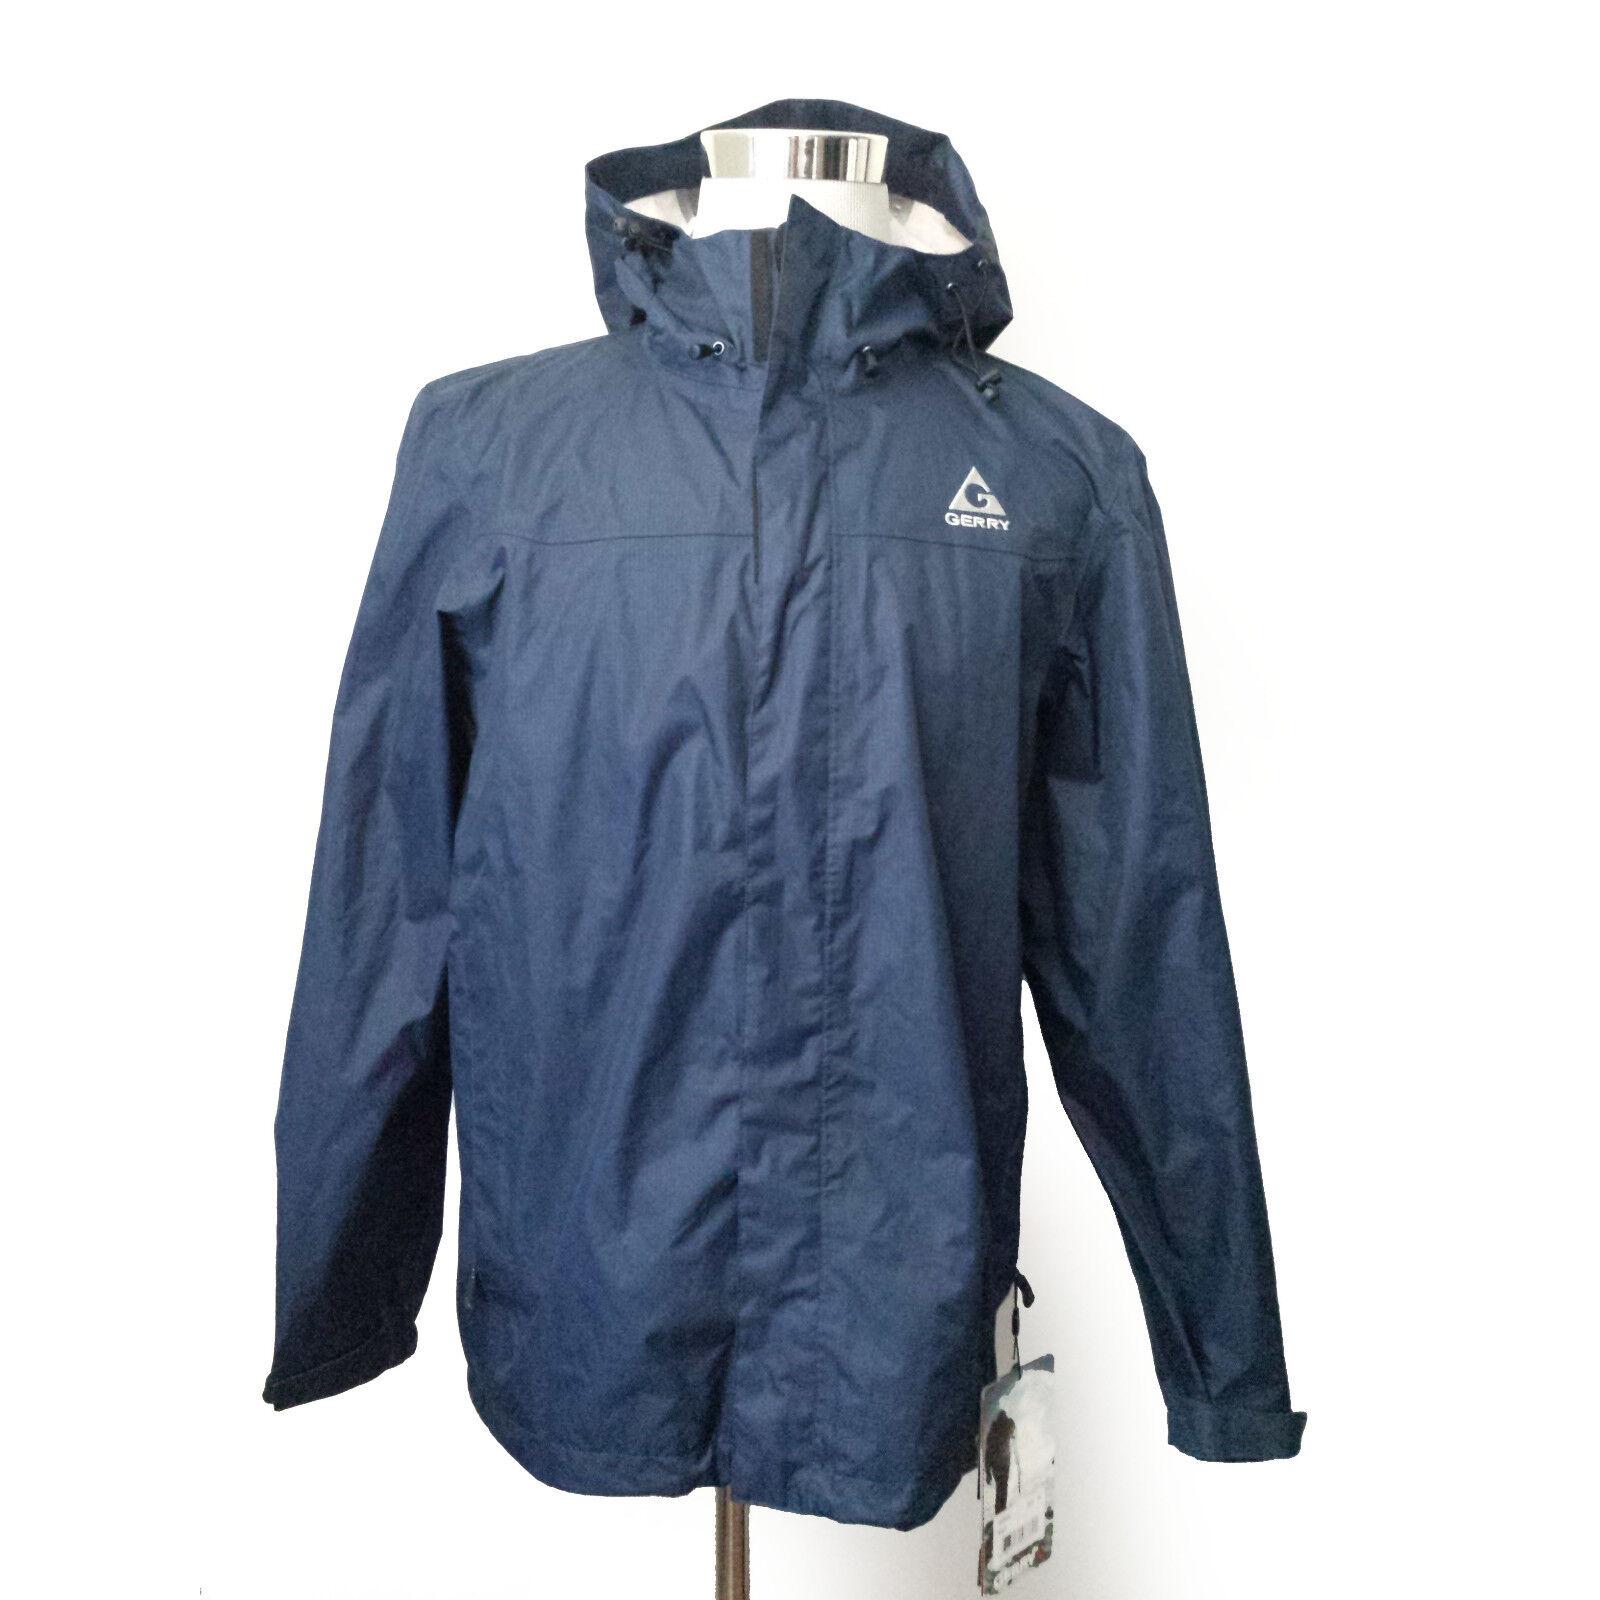 32 Degree Heat Weatherproof Puffer Men Size S Coat Jacket